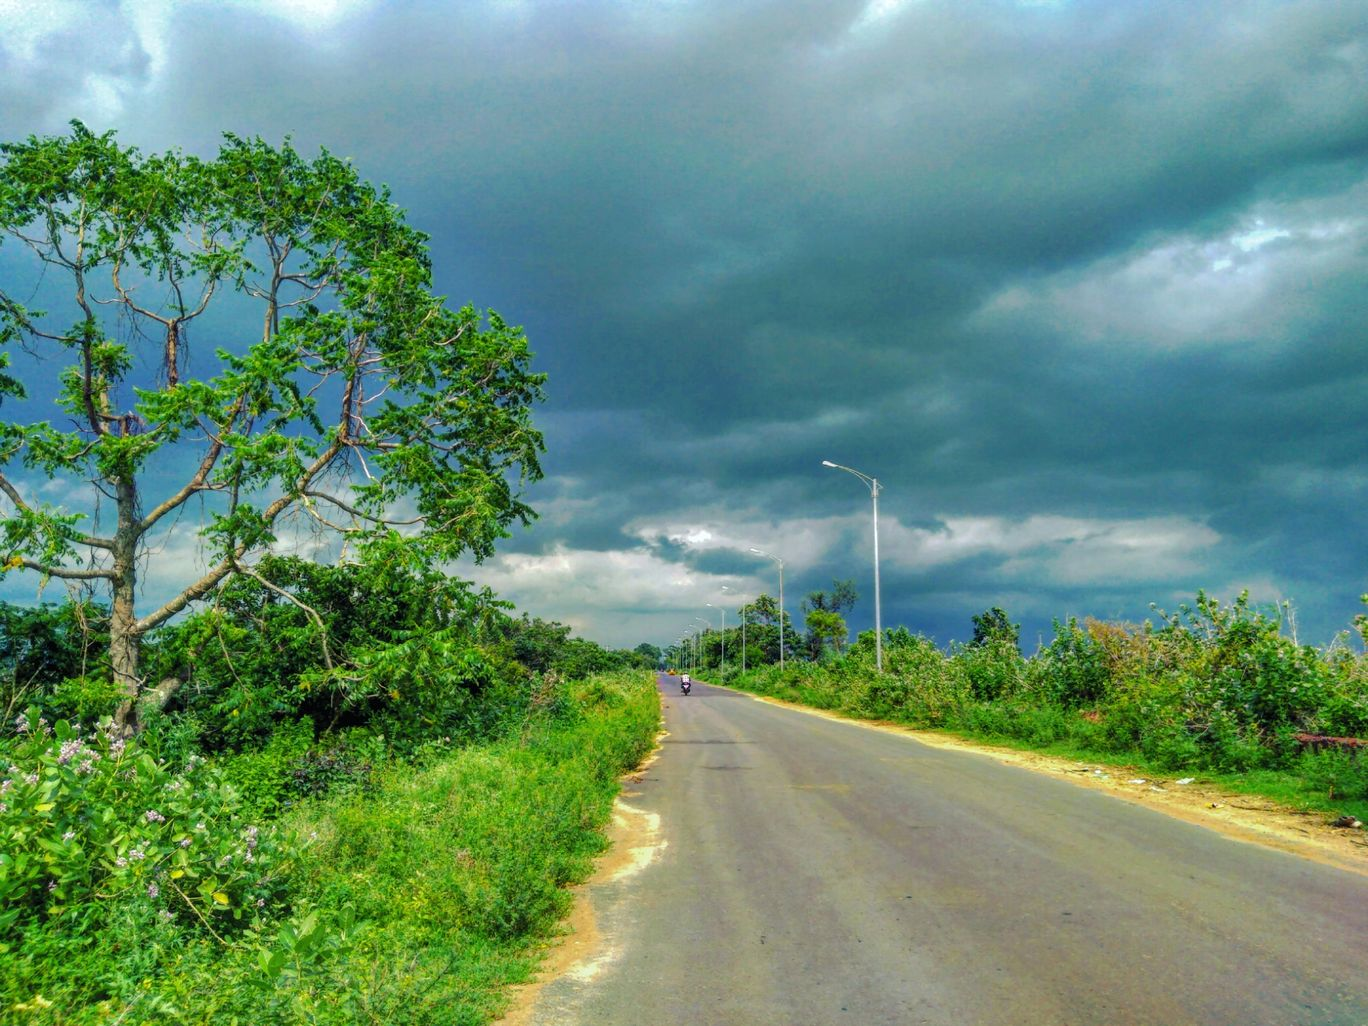 Photo of Odisha By Snehanshu Shome